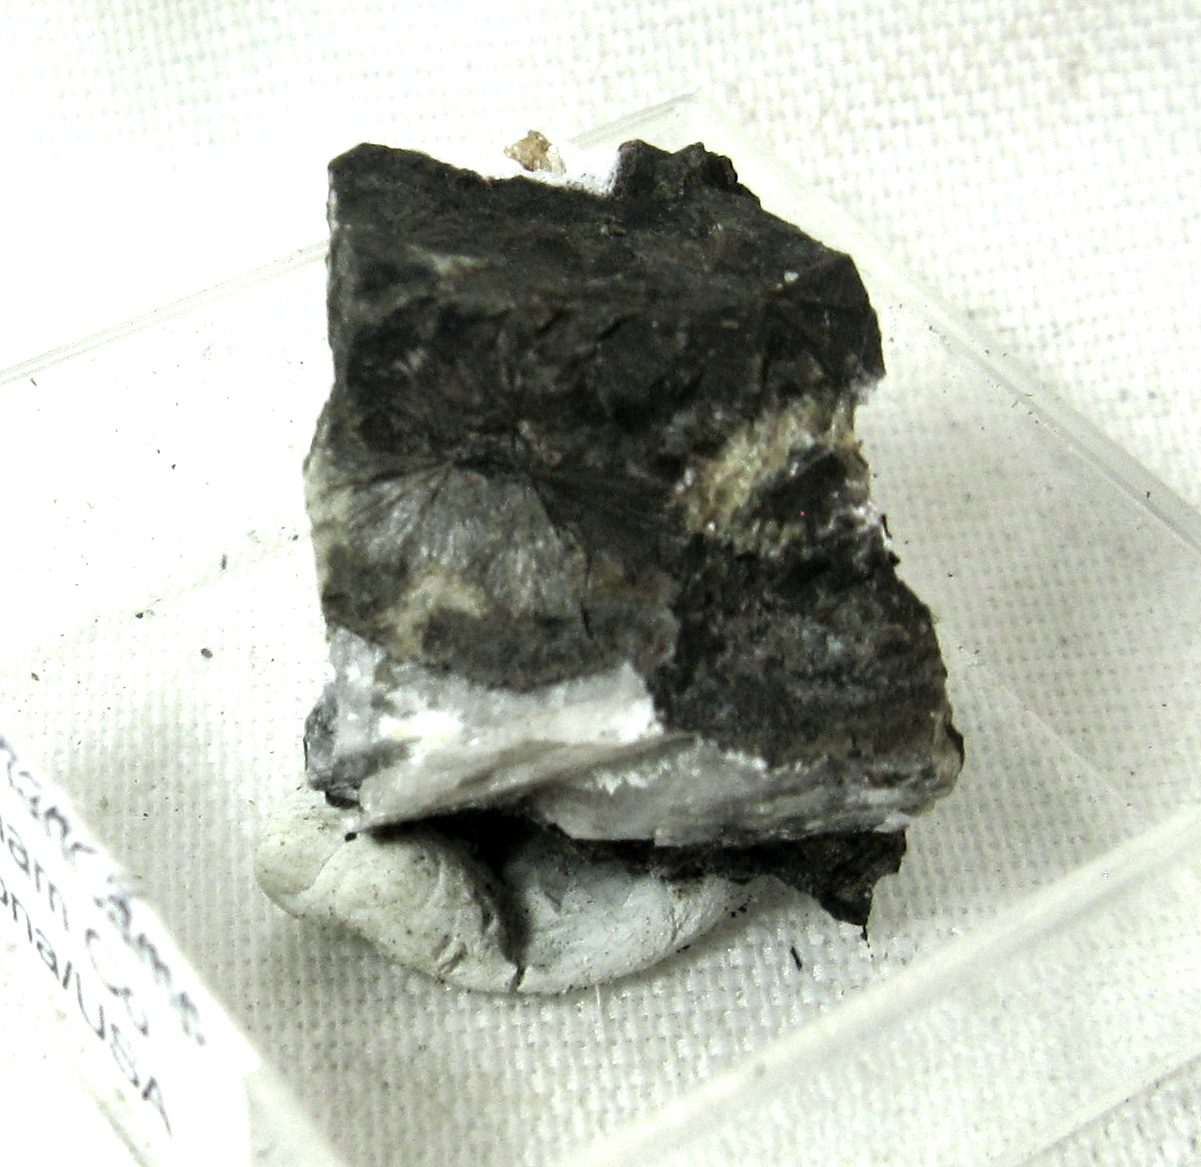 Nekoite & Johannsenite